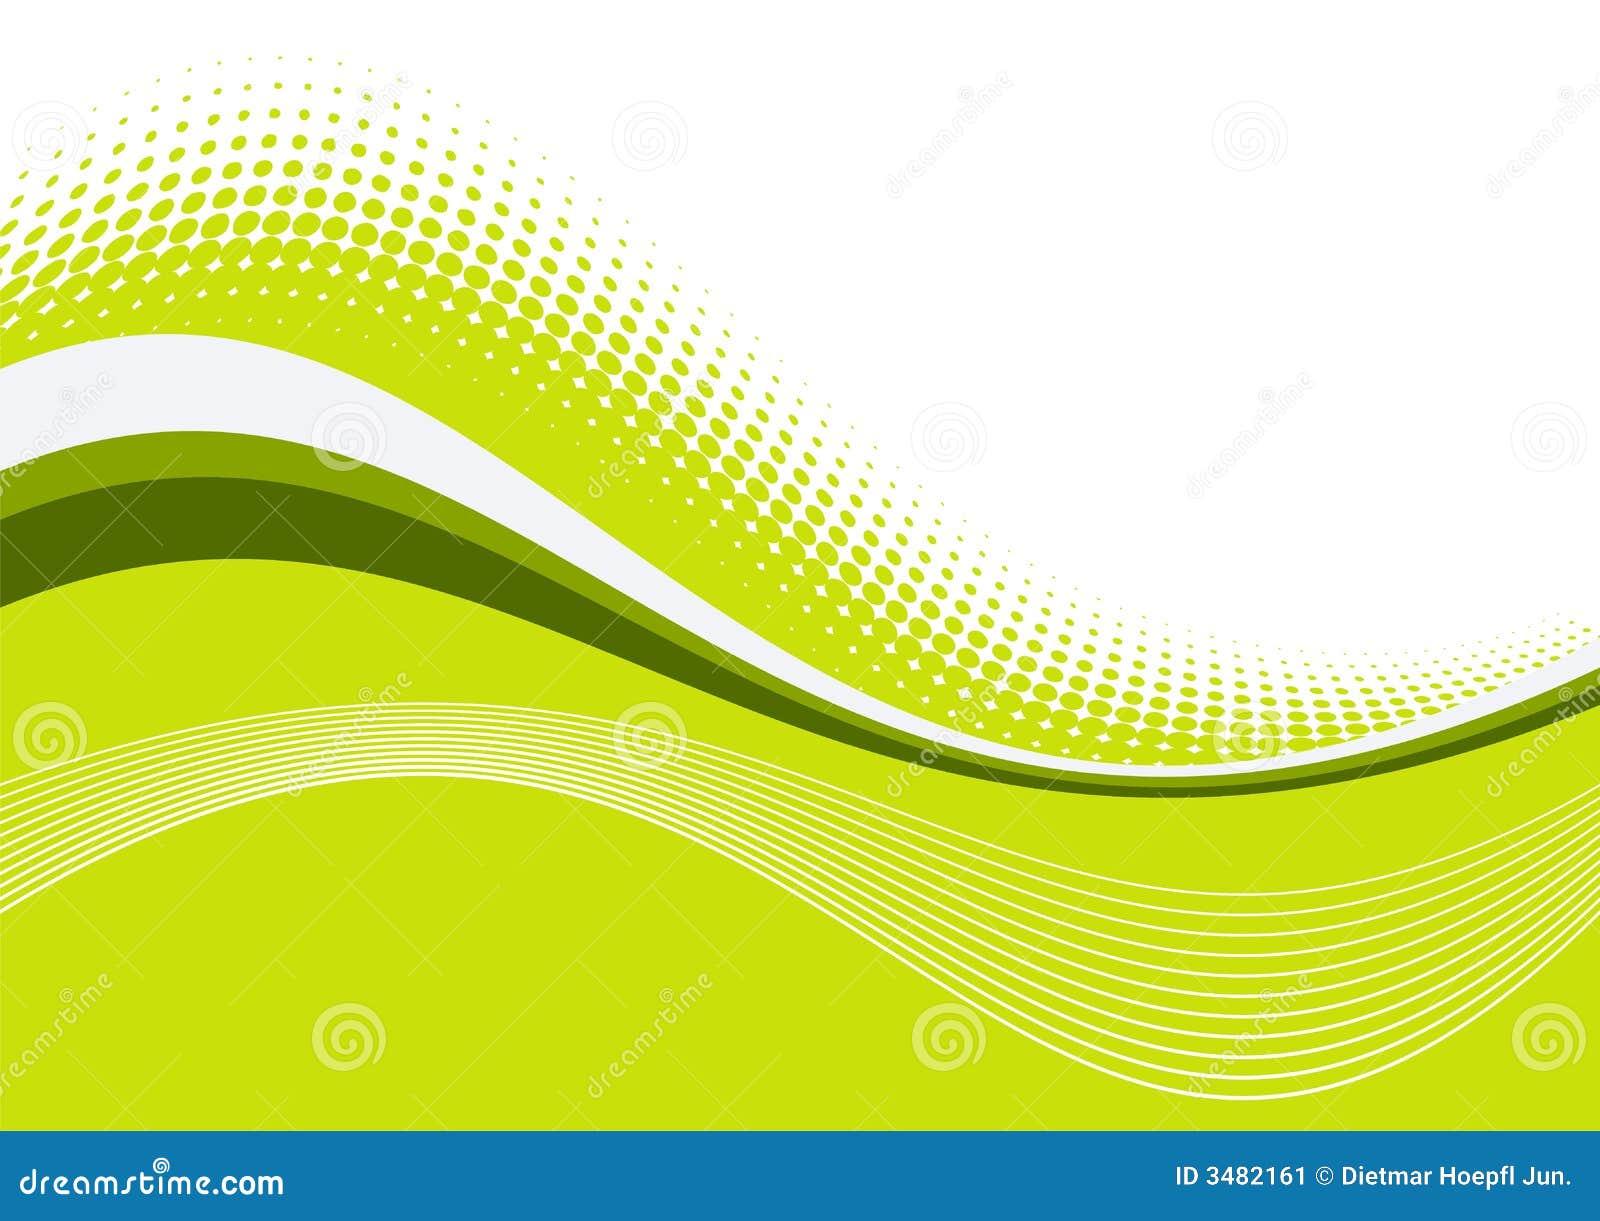 Líneas Agraciadas Onduladas Verdes